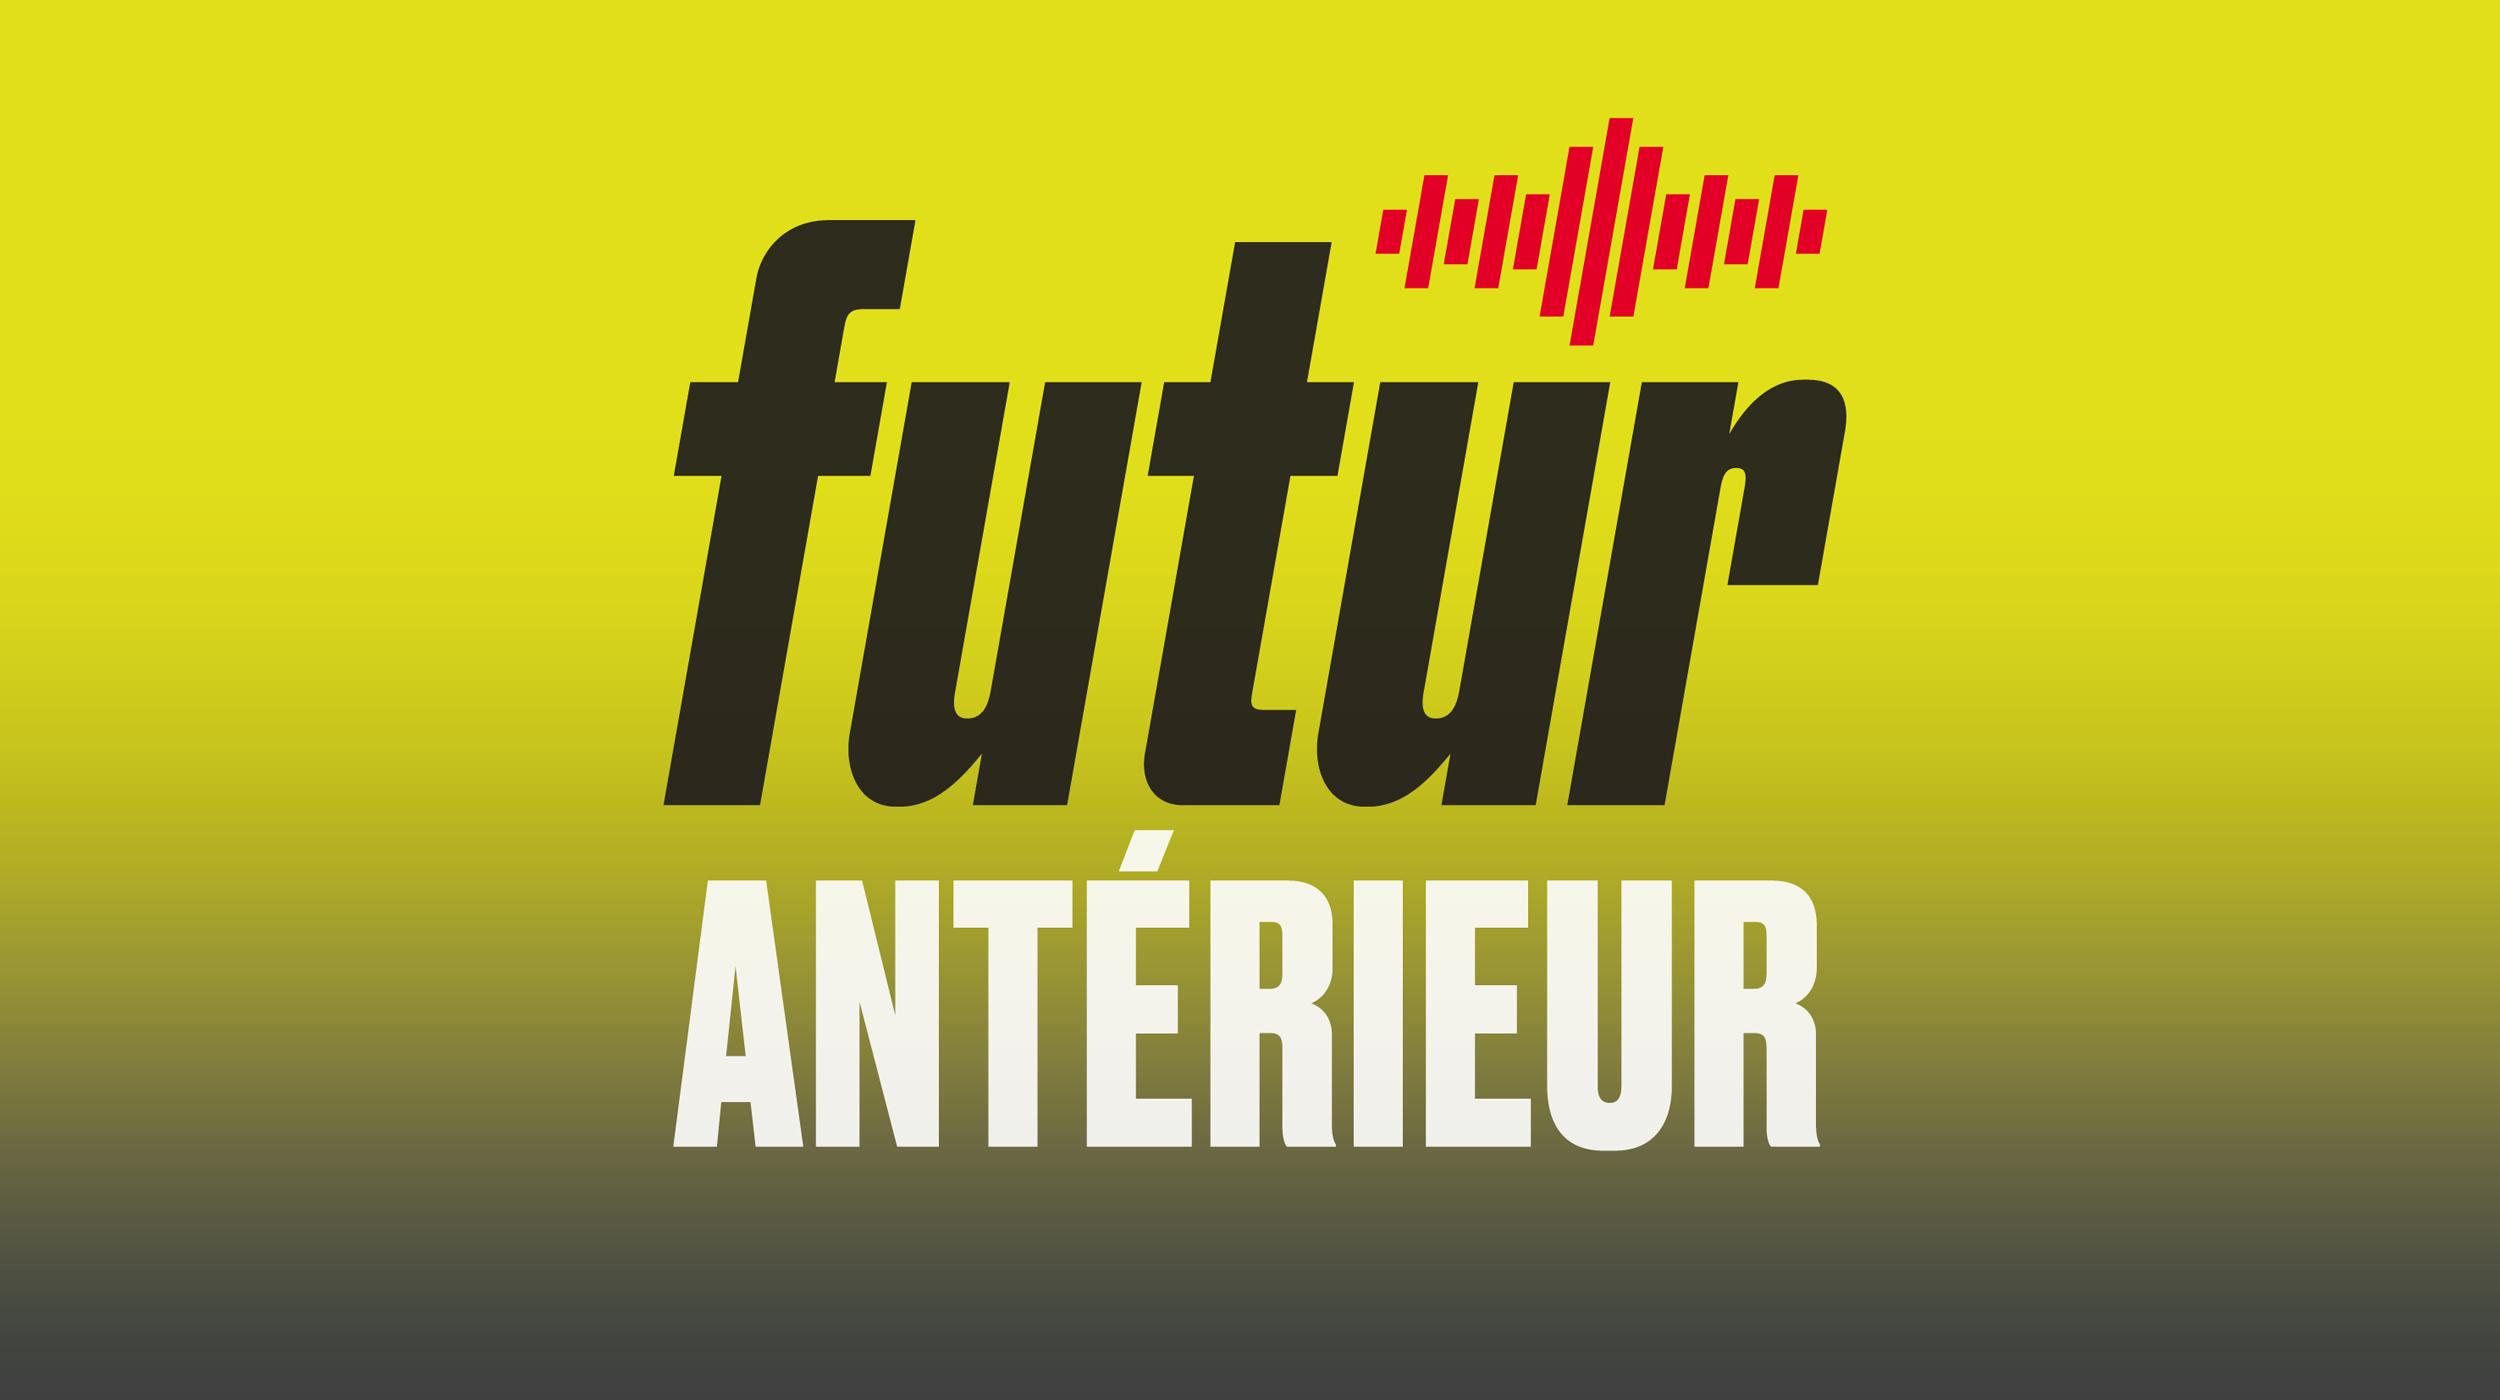 LOGO Futur anterieur 2500x1400 [RTS]